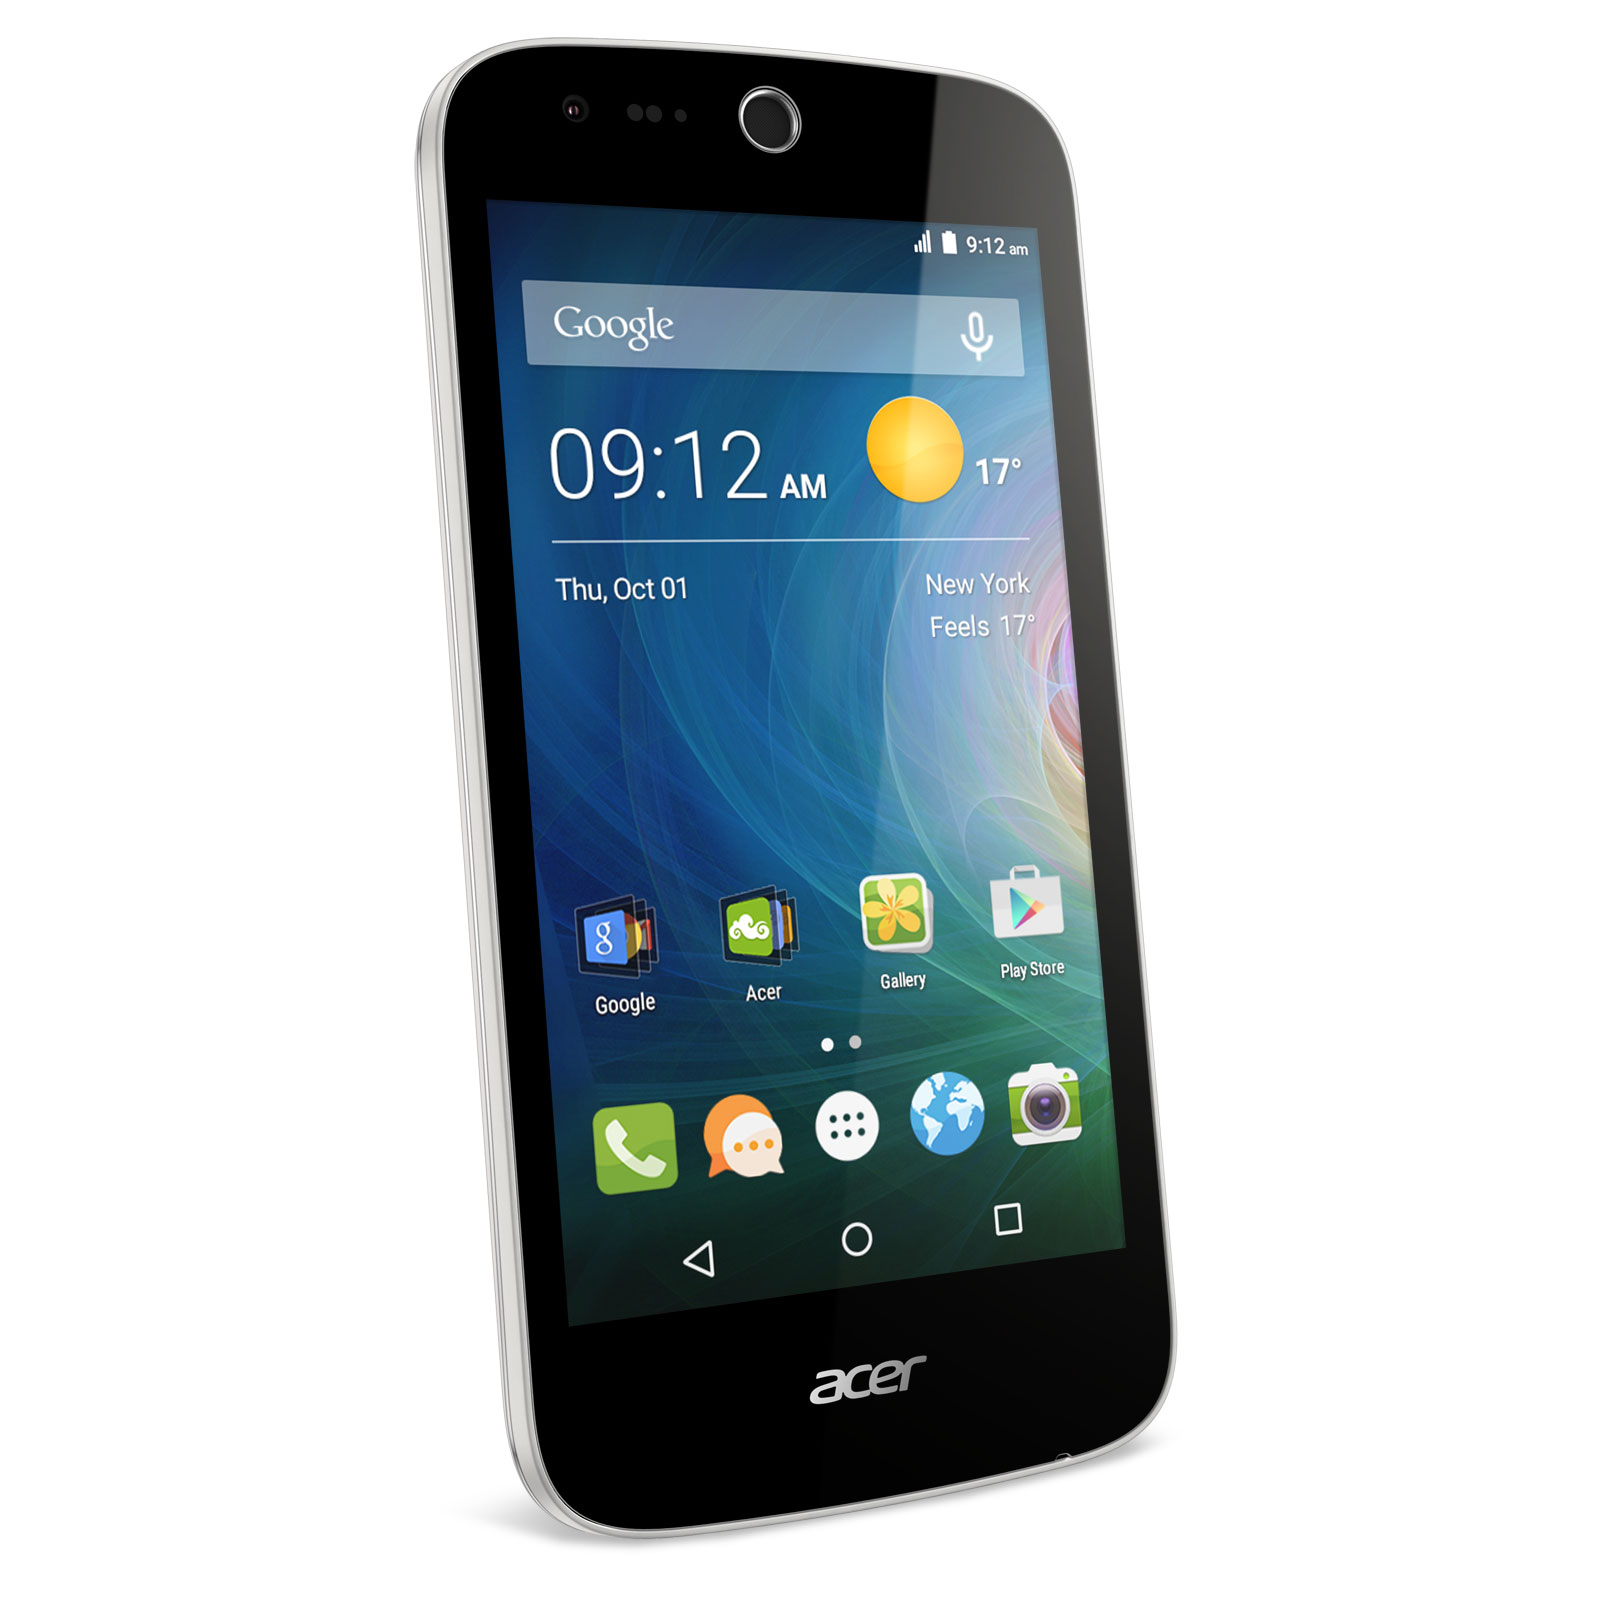 "Mobile & smartphone Acer Liquid Z330 Blanc Smartphone 4G-LTE Dual SIM - ARM Cortex A7 Quad-Core 1.1 GHz - RAM 1 Go - Ecran tactile 4.5"" 480 x 854 - 8 Go - Bluetooth 4.0 - 2000 mAh - Android 5.0"